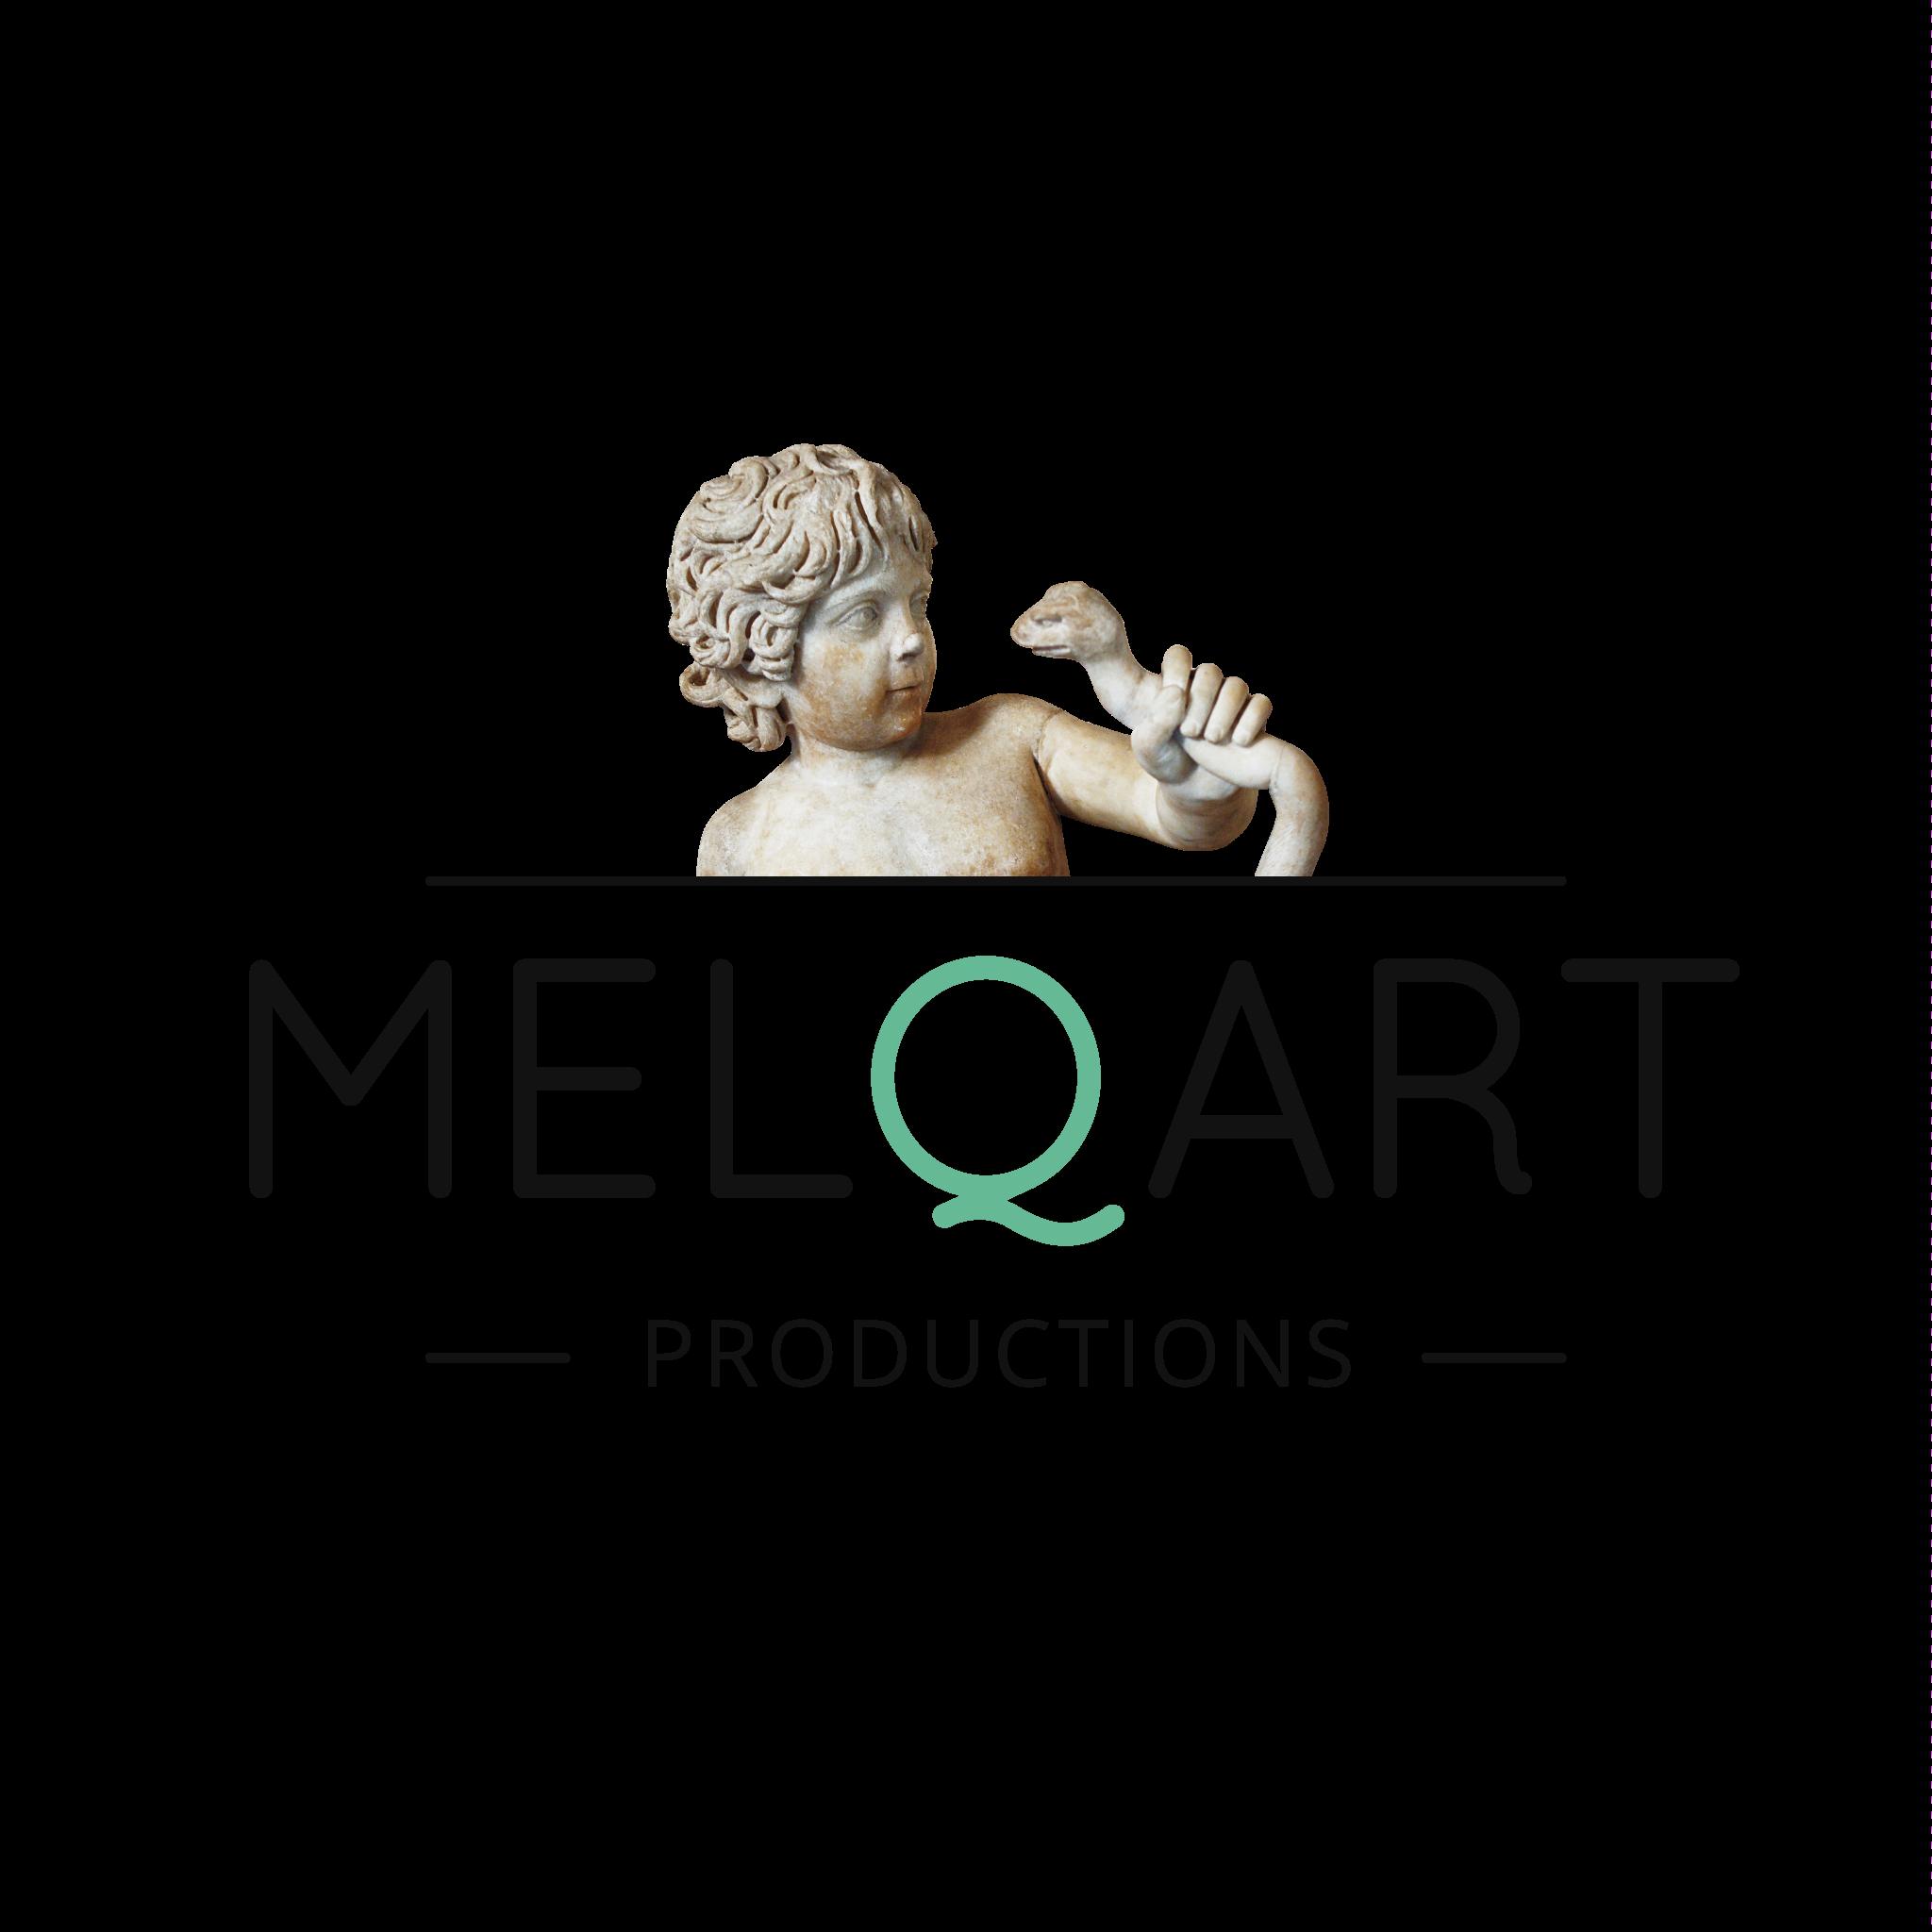 Melqart_Loghi_Def_WhiteBG